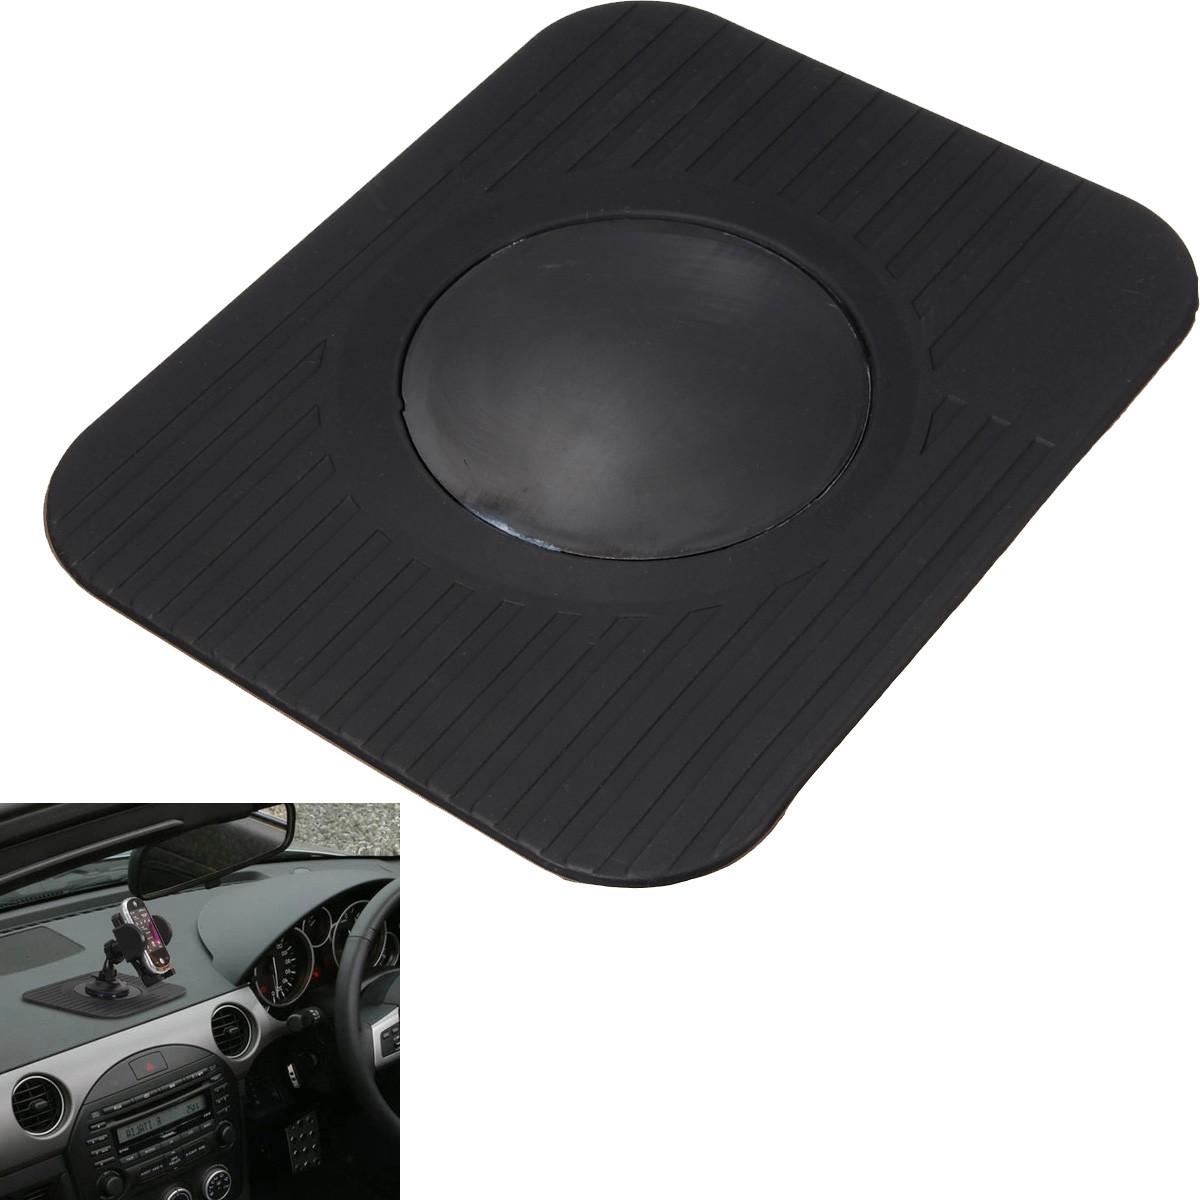 kfz pkw auto konsole matte antirutsch pad f r gps navi. Black Bedroom Furniture Sets. Home Design Ideas